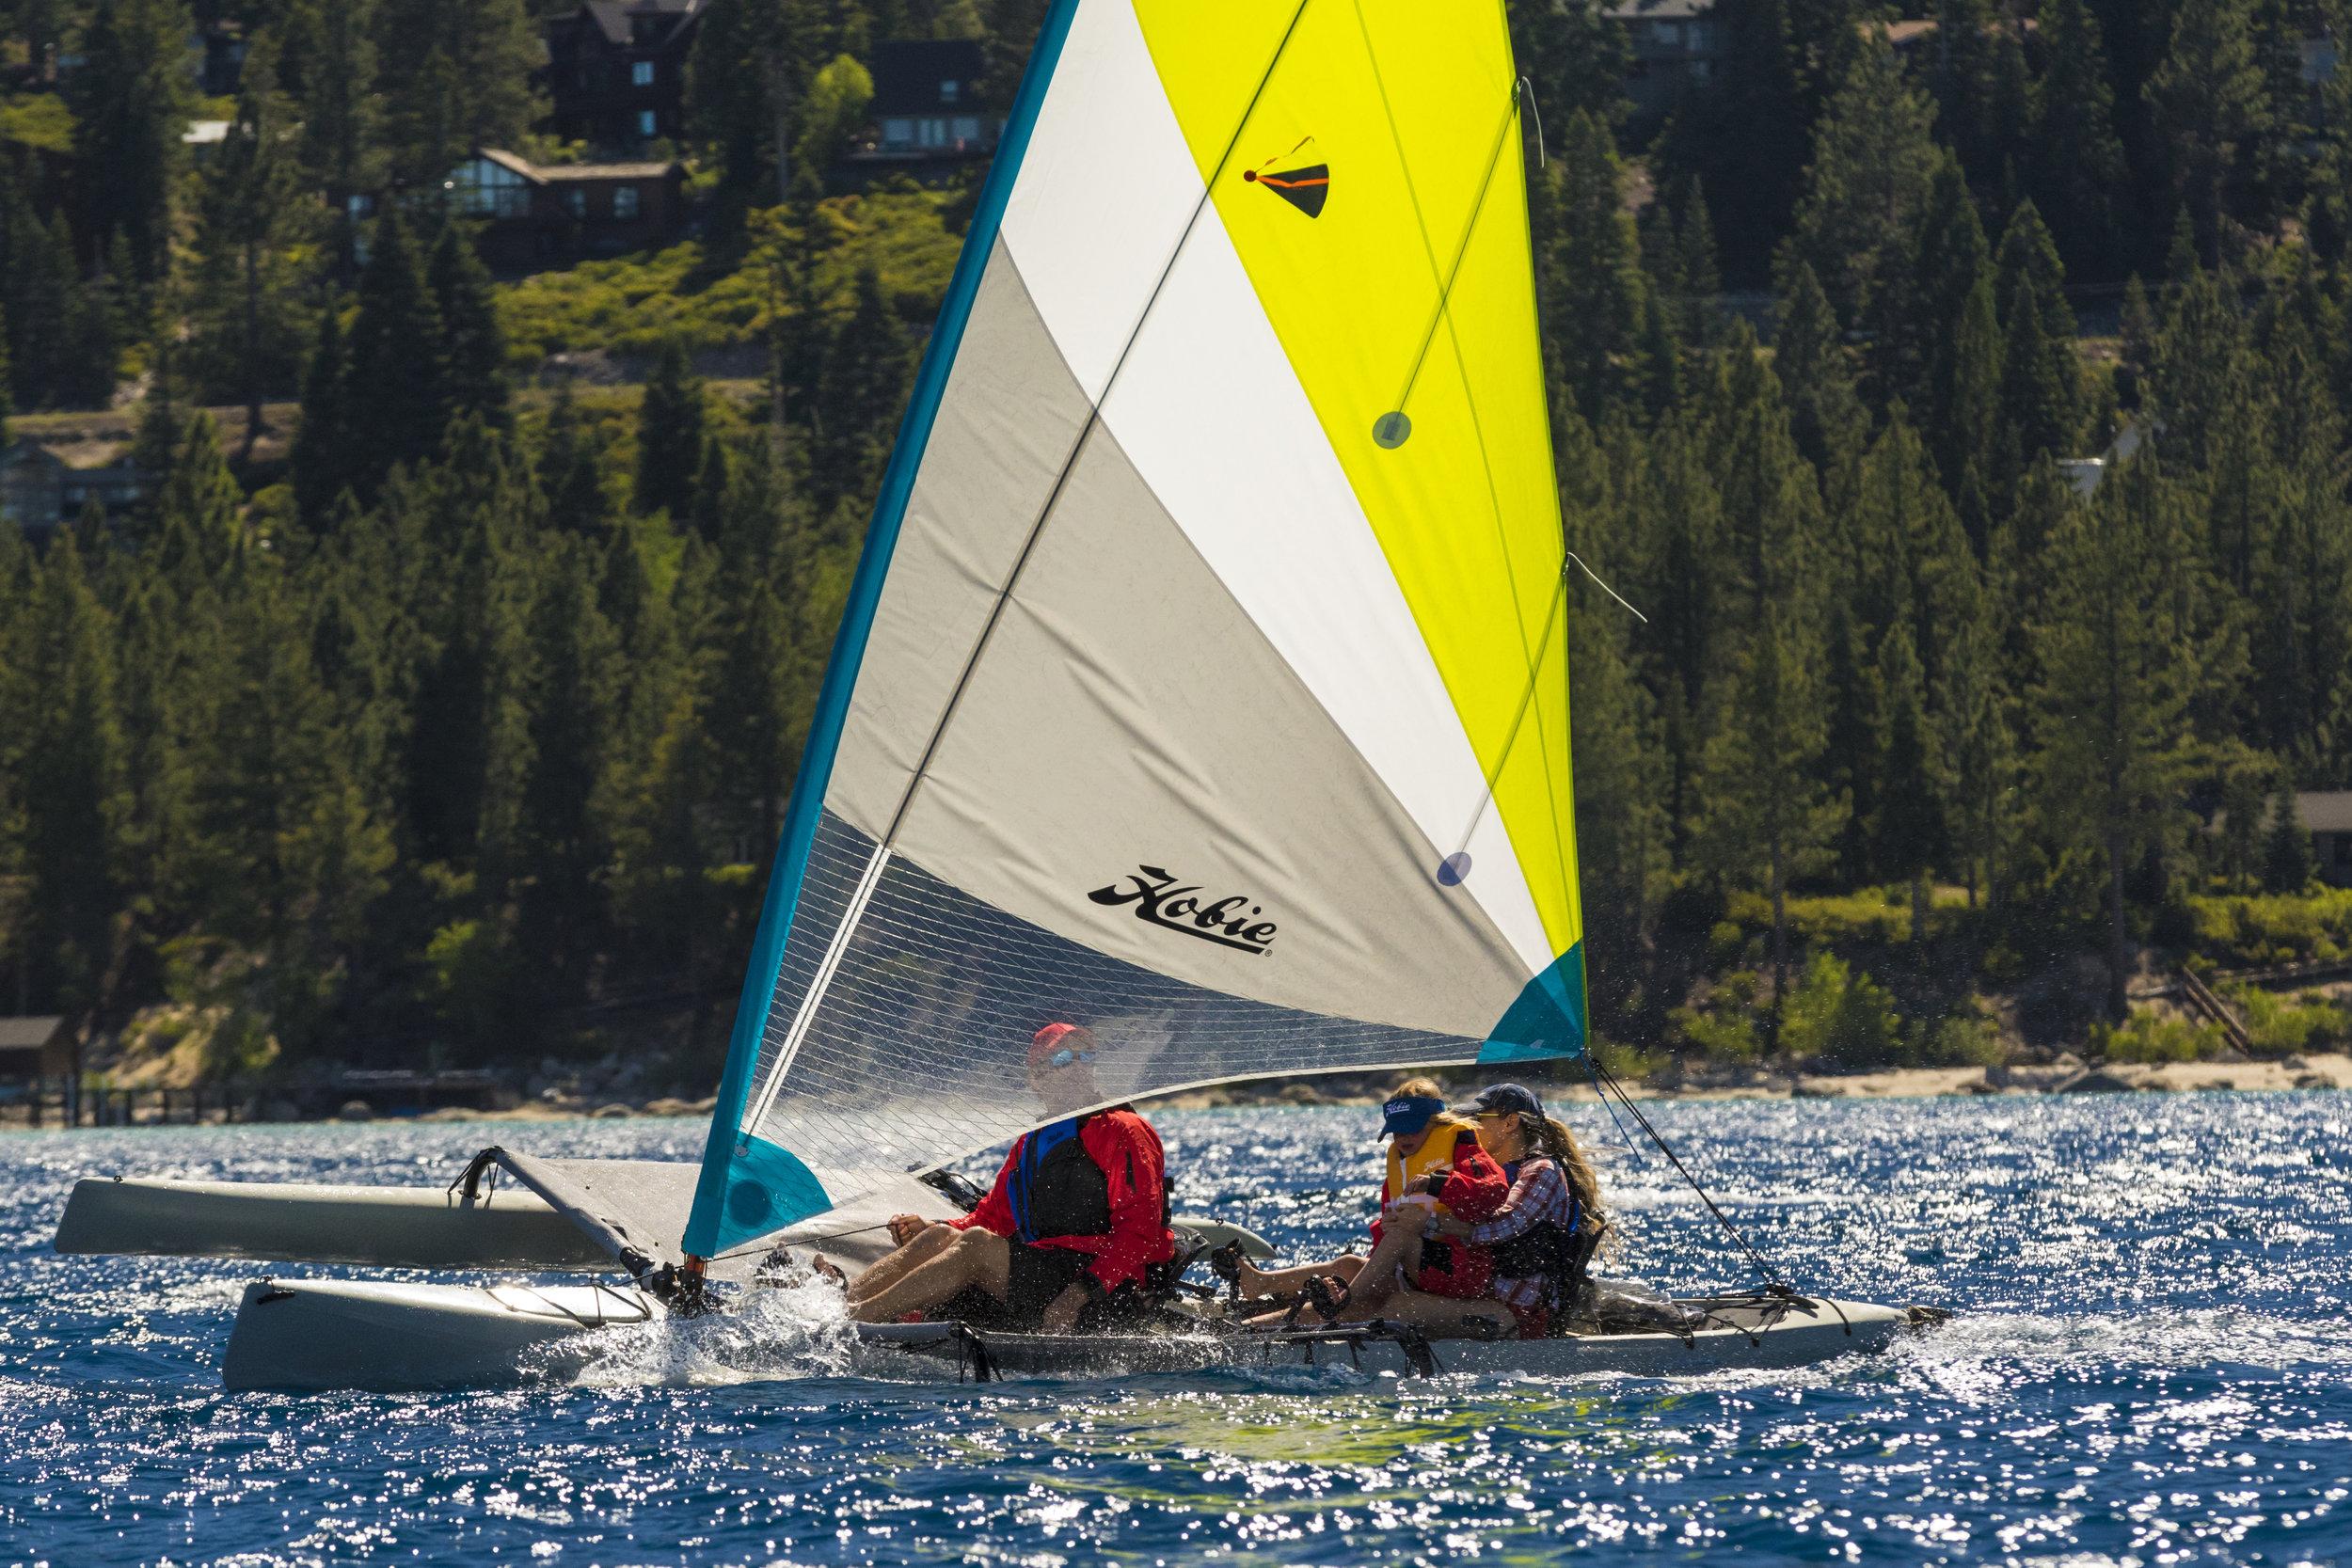 Tandem_Island_action_Tahoe_family_dune_windy_speed_2581_full.jpg